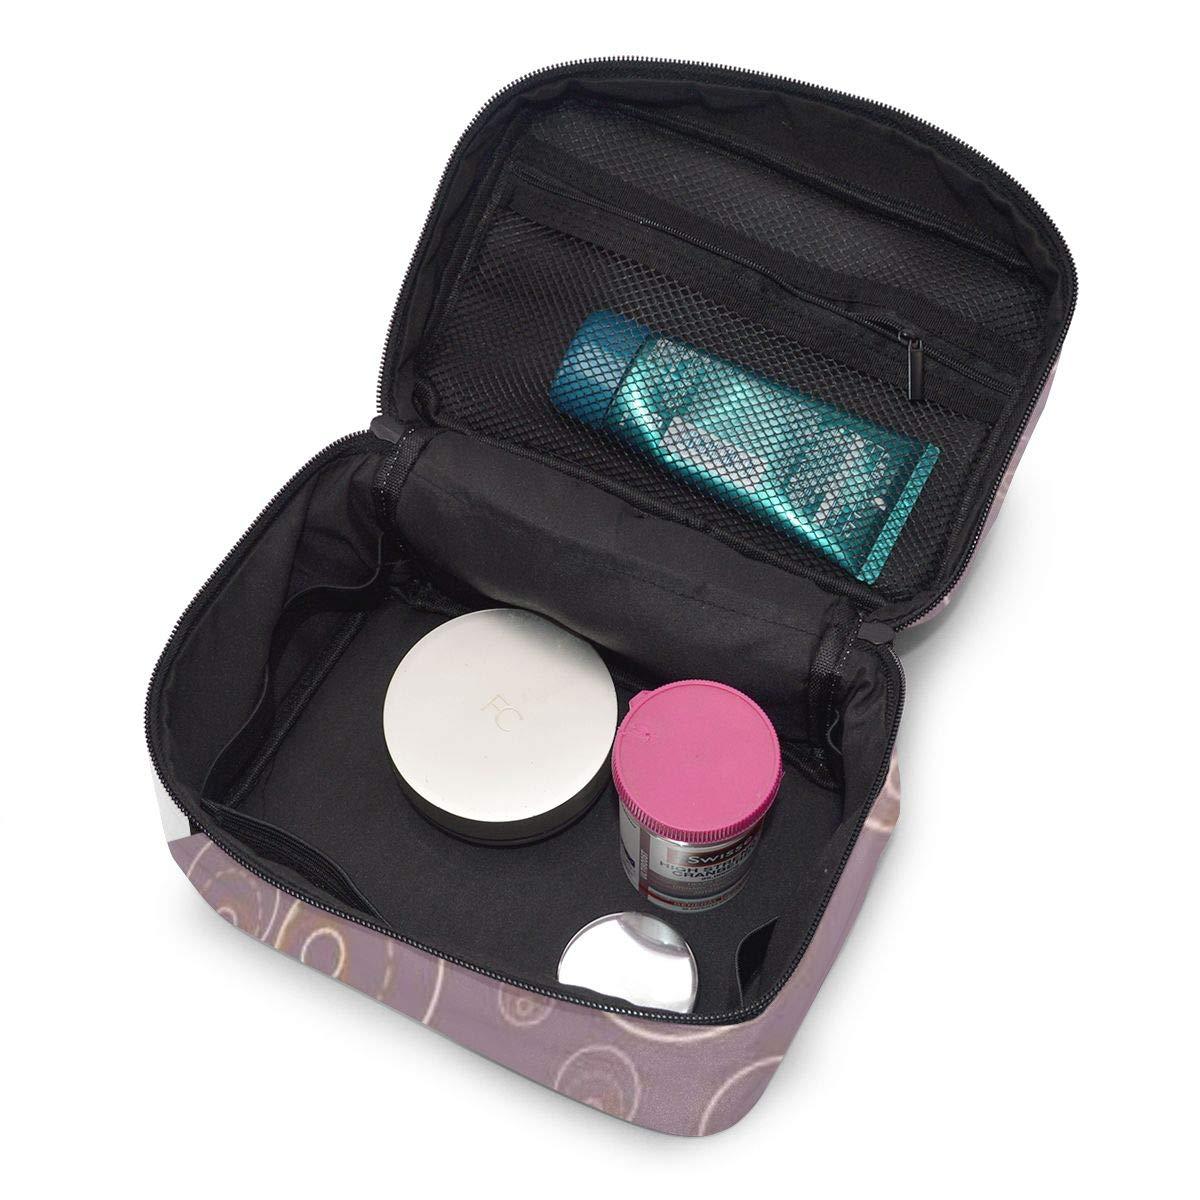 Portable Travel Toiletry Bag Organizer,Abstract Cosmetic Bags For Women Girl,Makeup Bag, Storage Bag